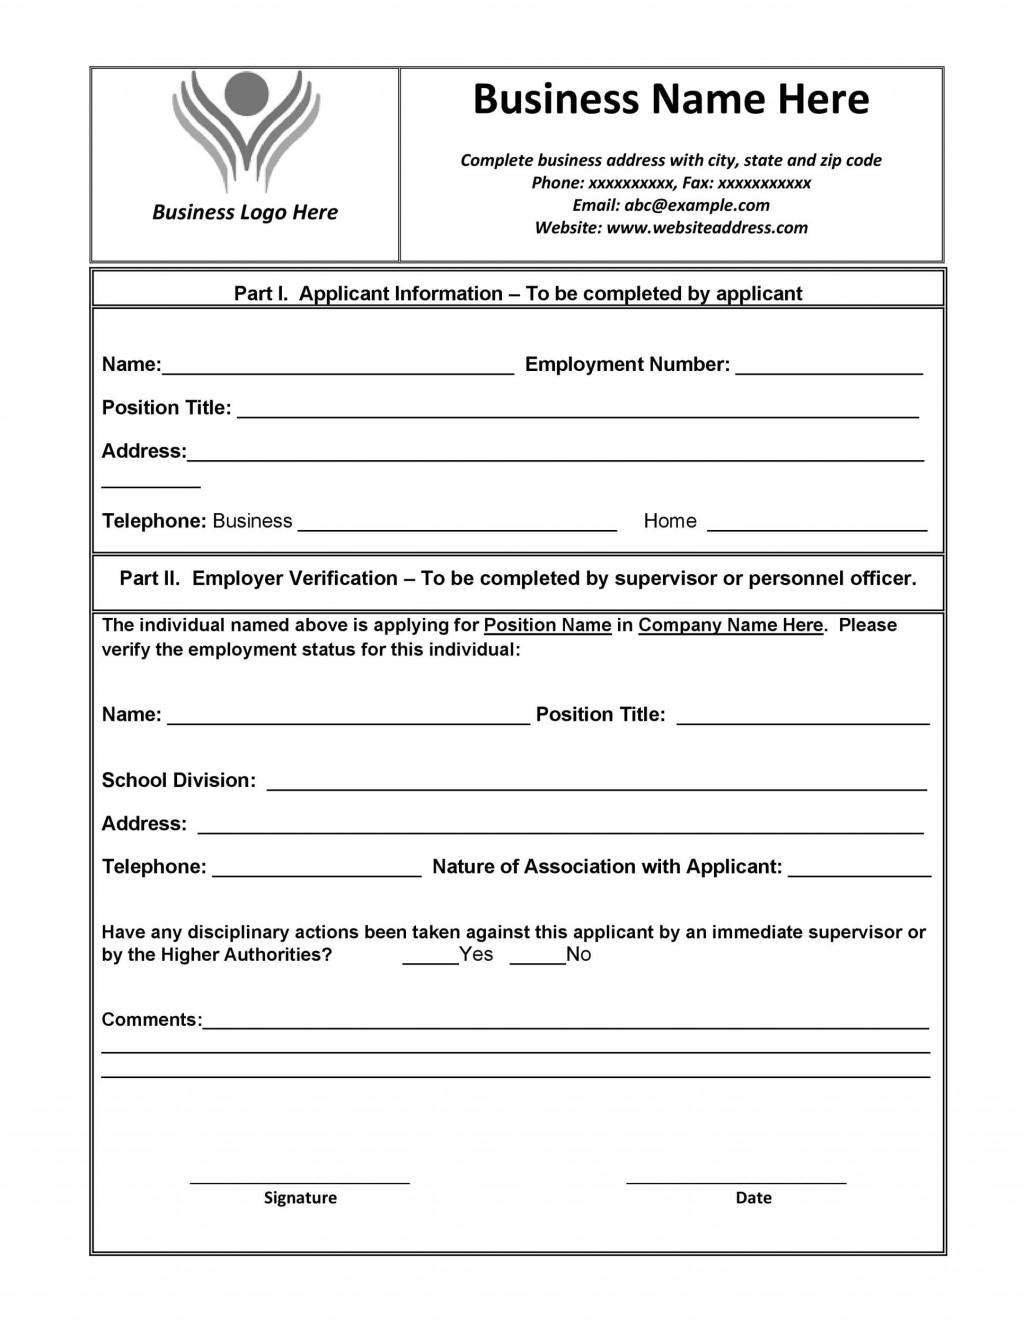 005 Frightening Employment Verification Form Template Image  Templates Previou Past PrintableLarge